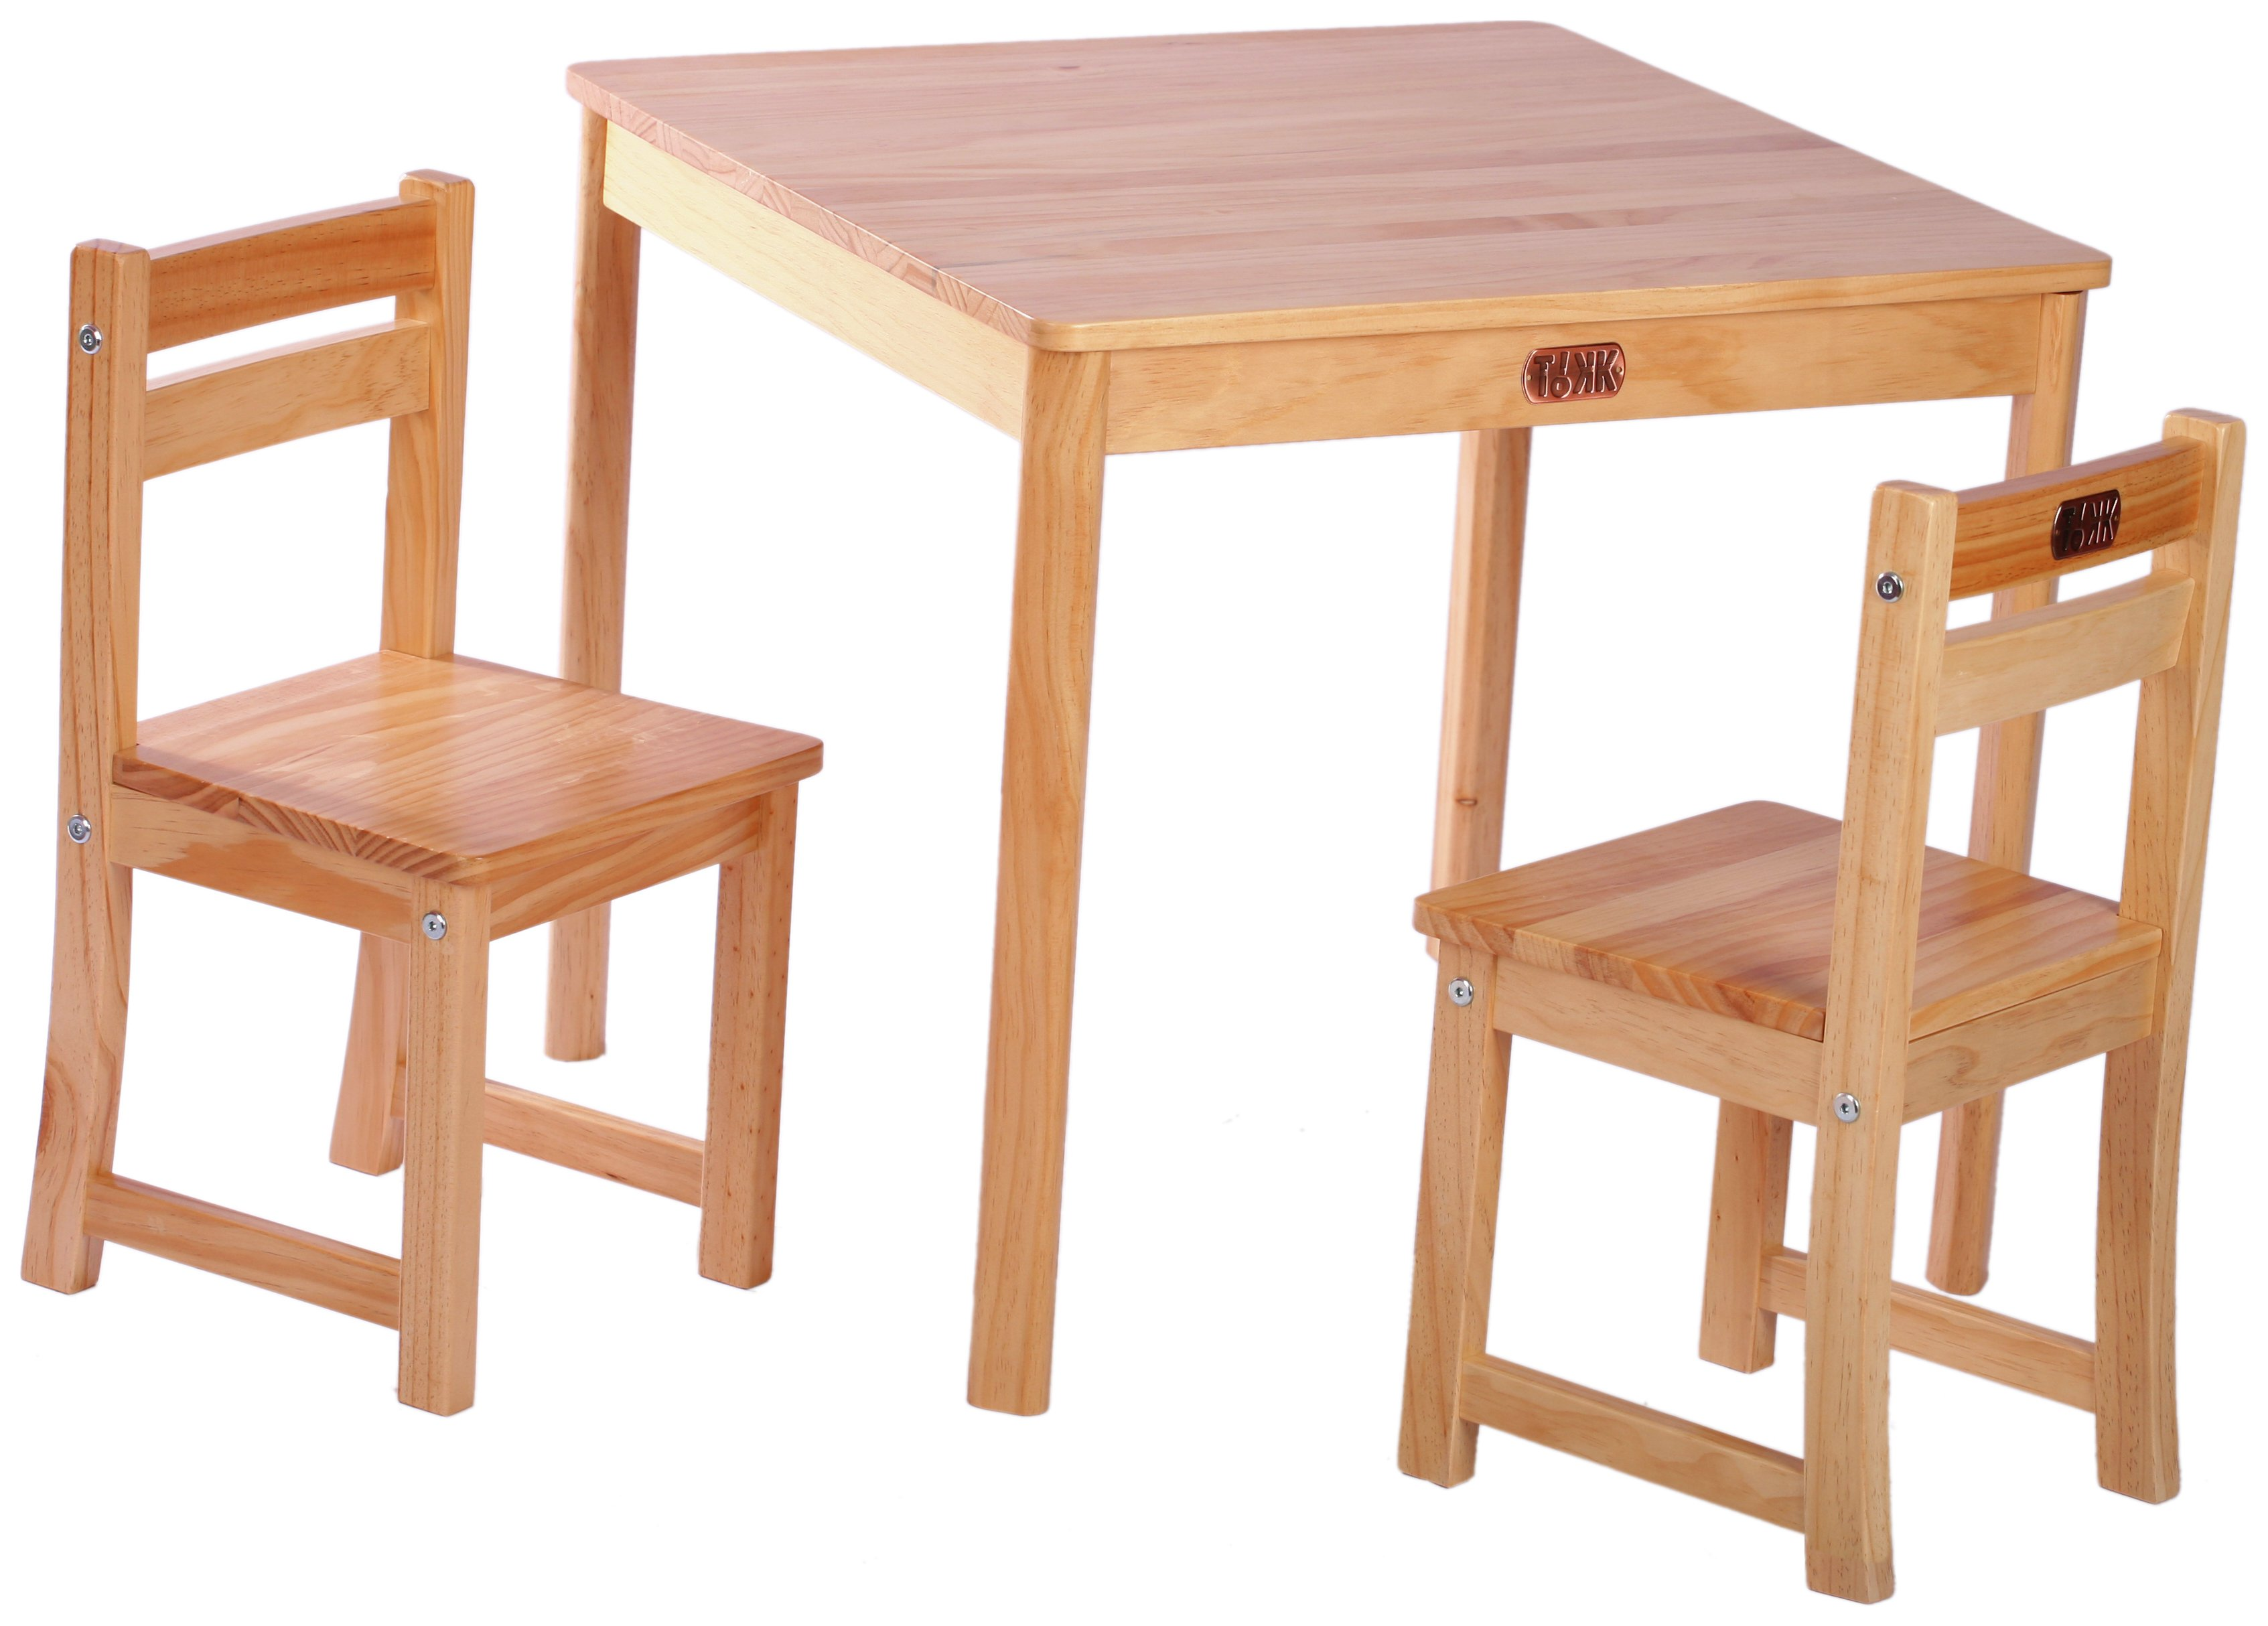 liberty-house-toys-tikk-tokk-boss-table-chair-set-natural